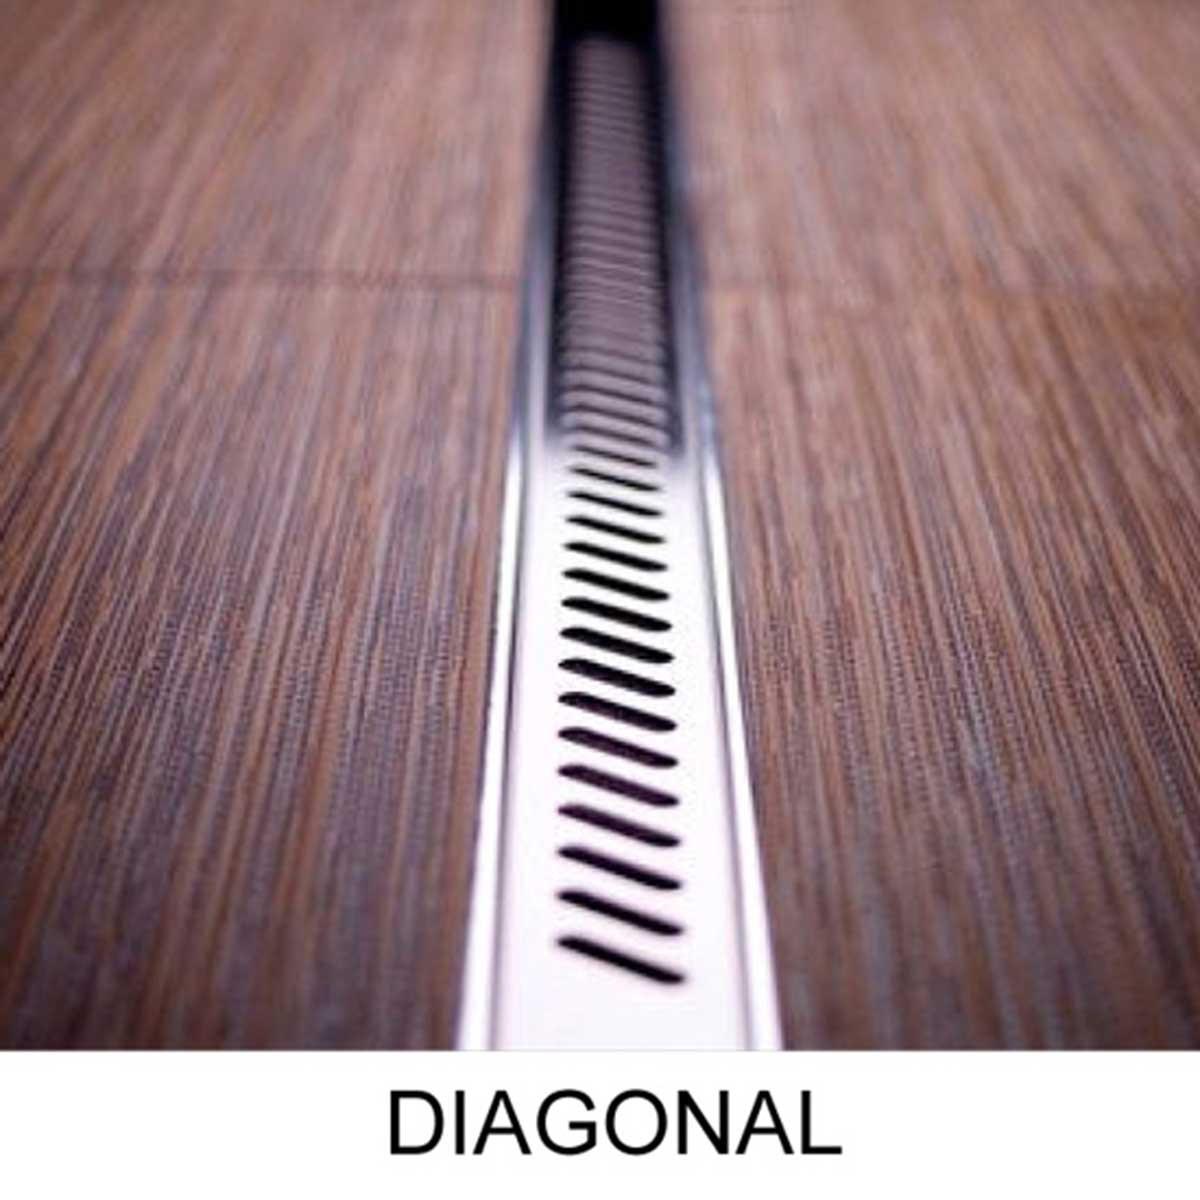 Diagonal Quick Drain ProLine Drain Covers